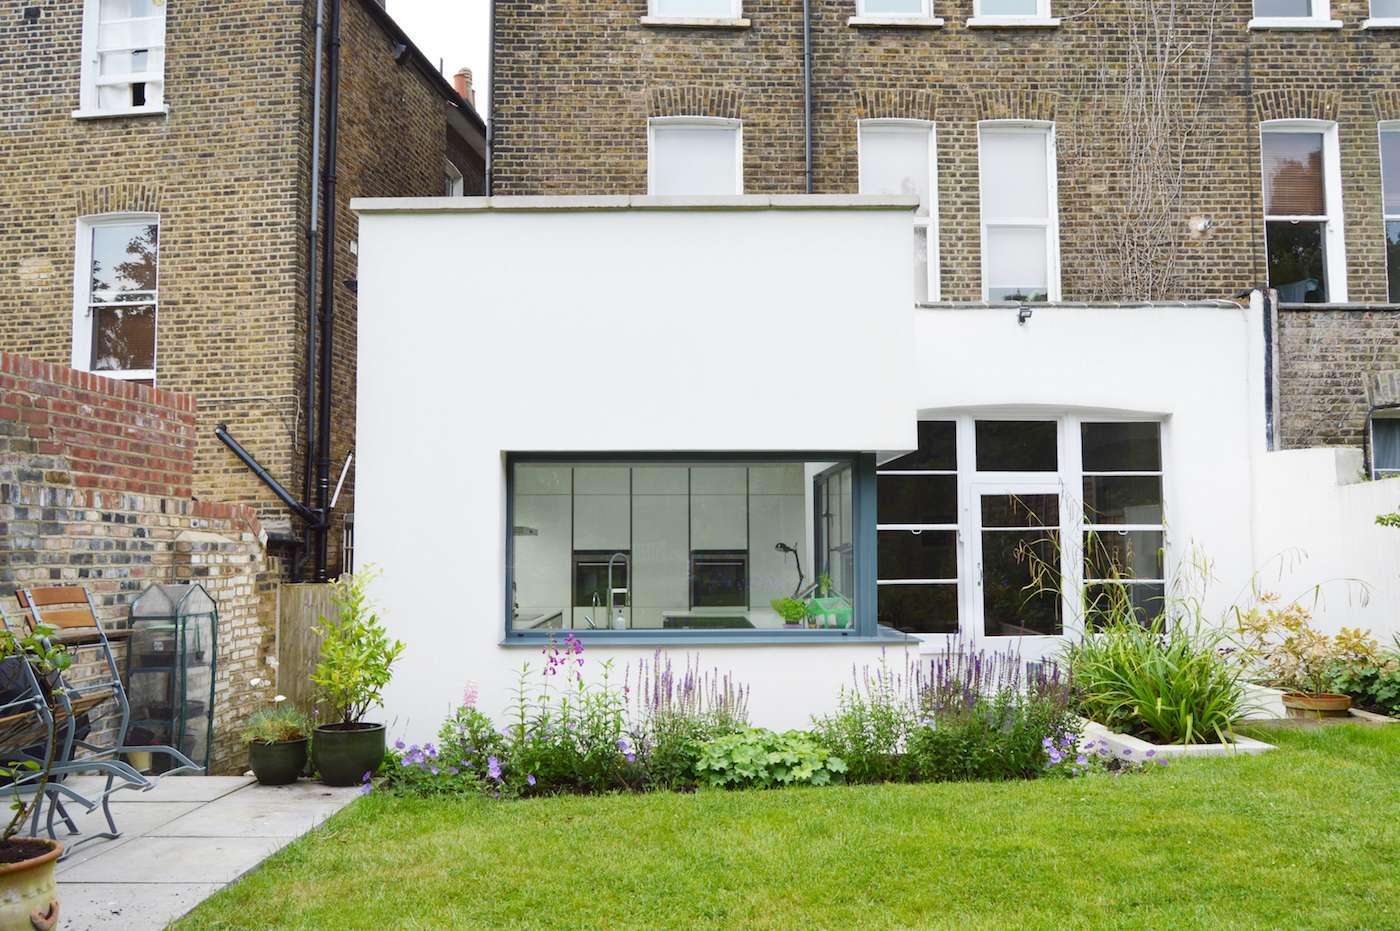 Architect designed garden flat extension Kilburn Brent NW2 External elevation Flat extensions in London | Home ideas